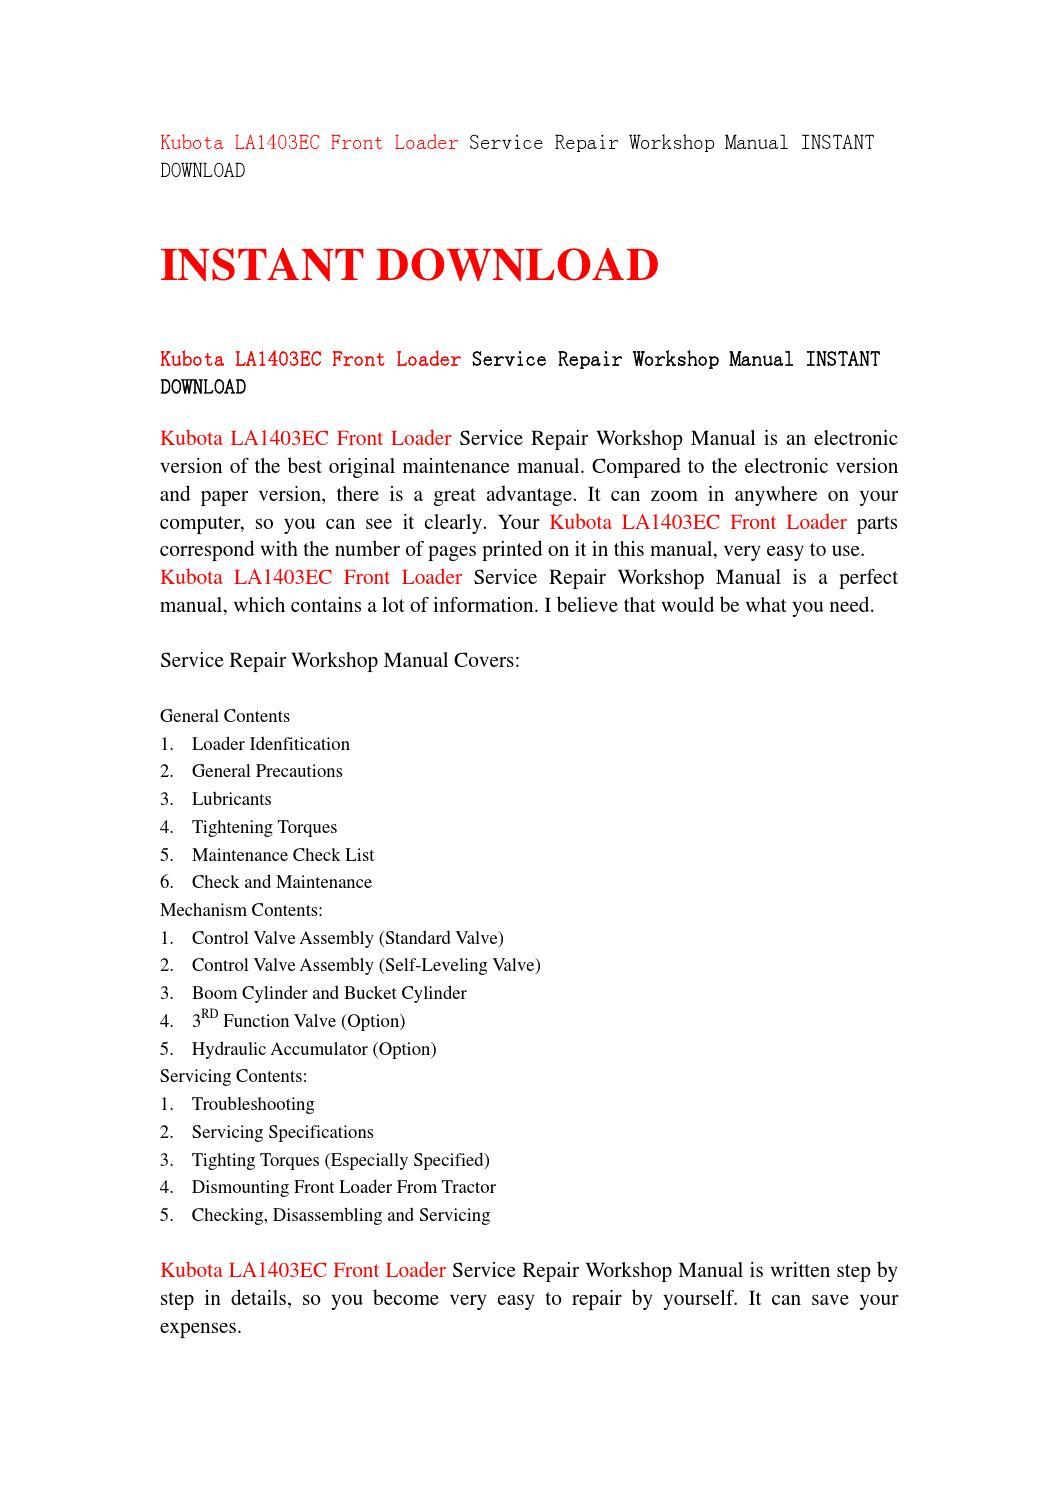 Kubota la1403ec front loader service repair workshop manual instant  download by fgbhvvffff - issuu